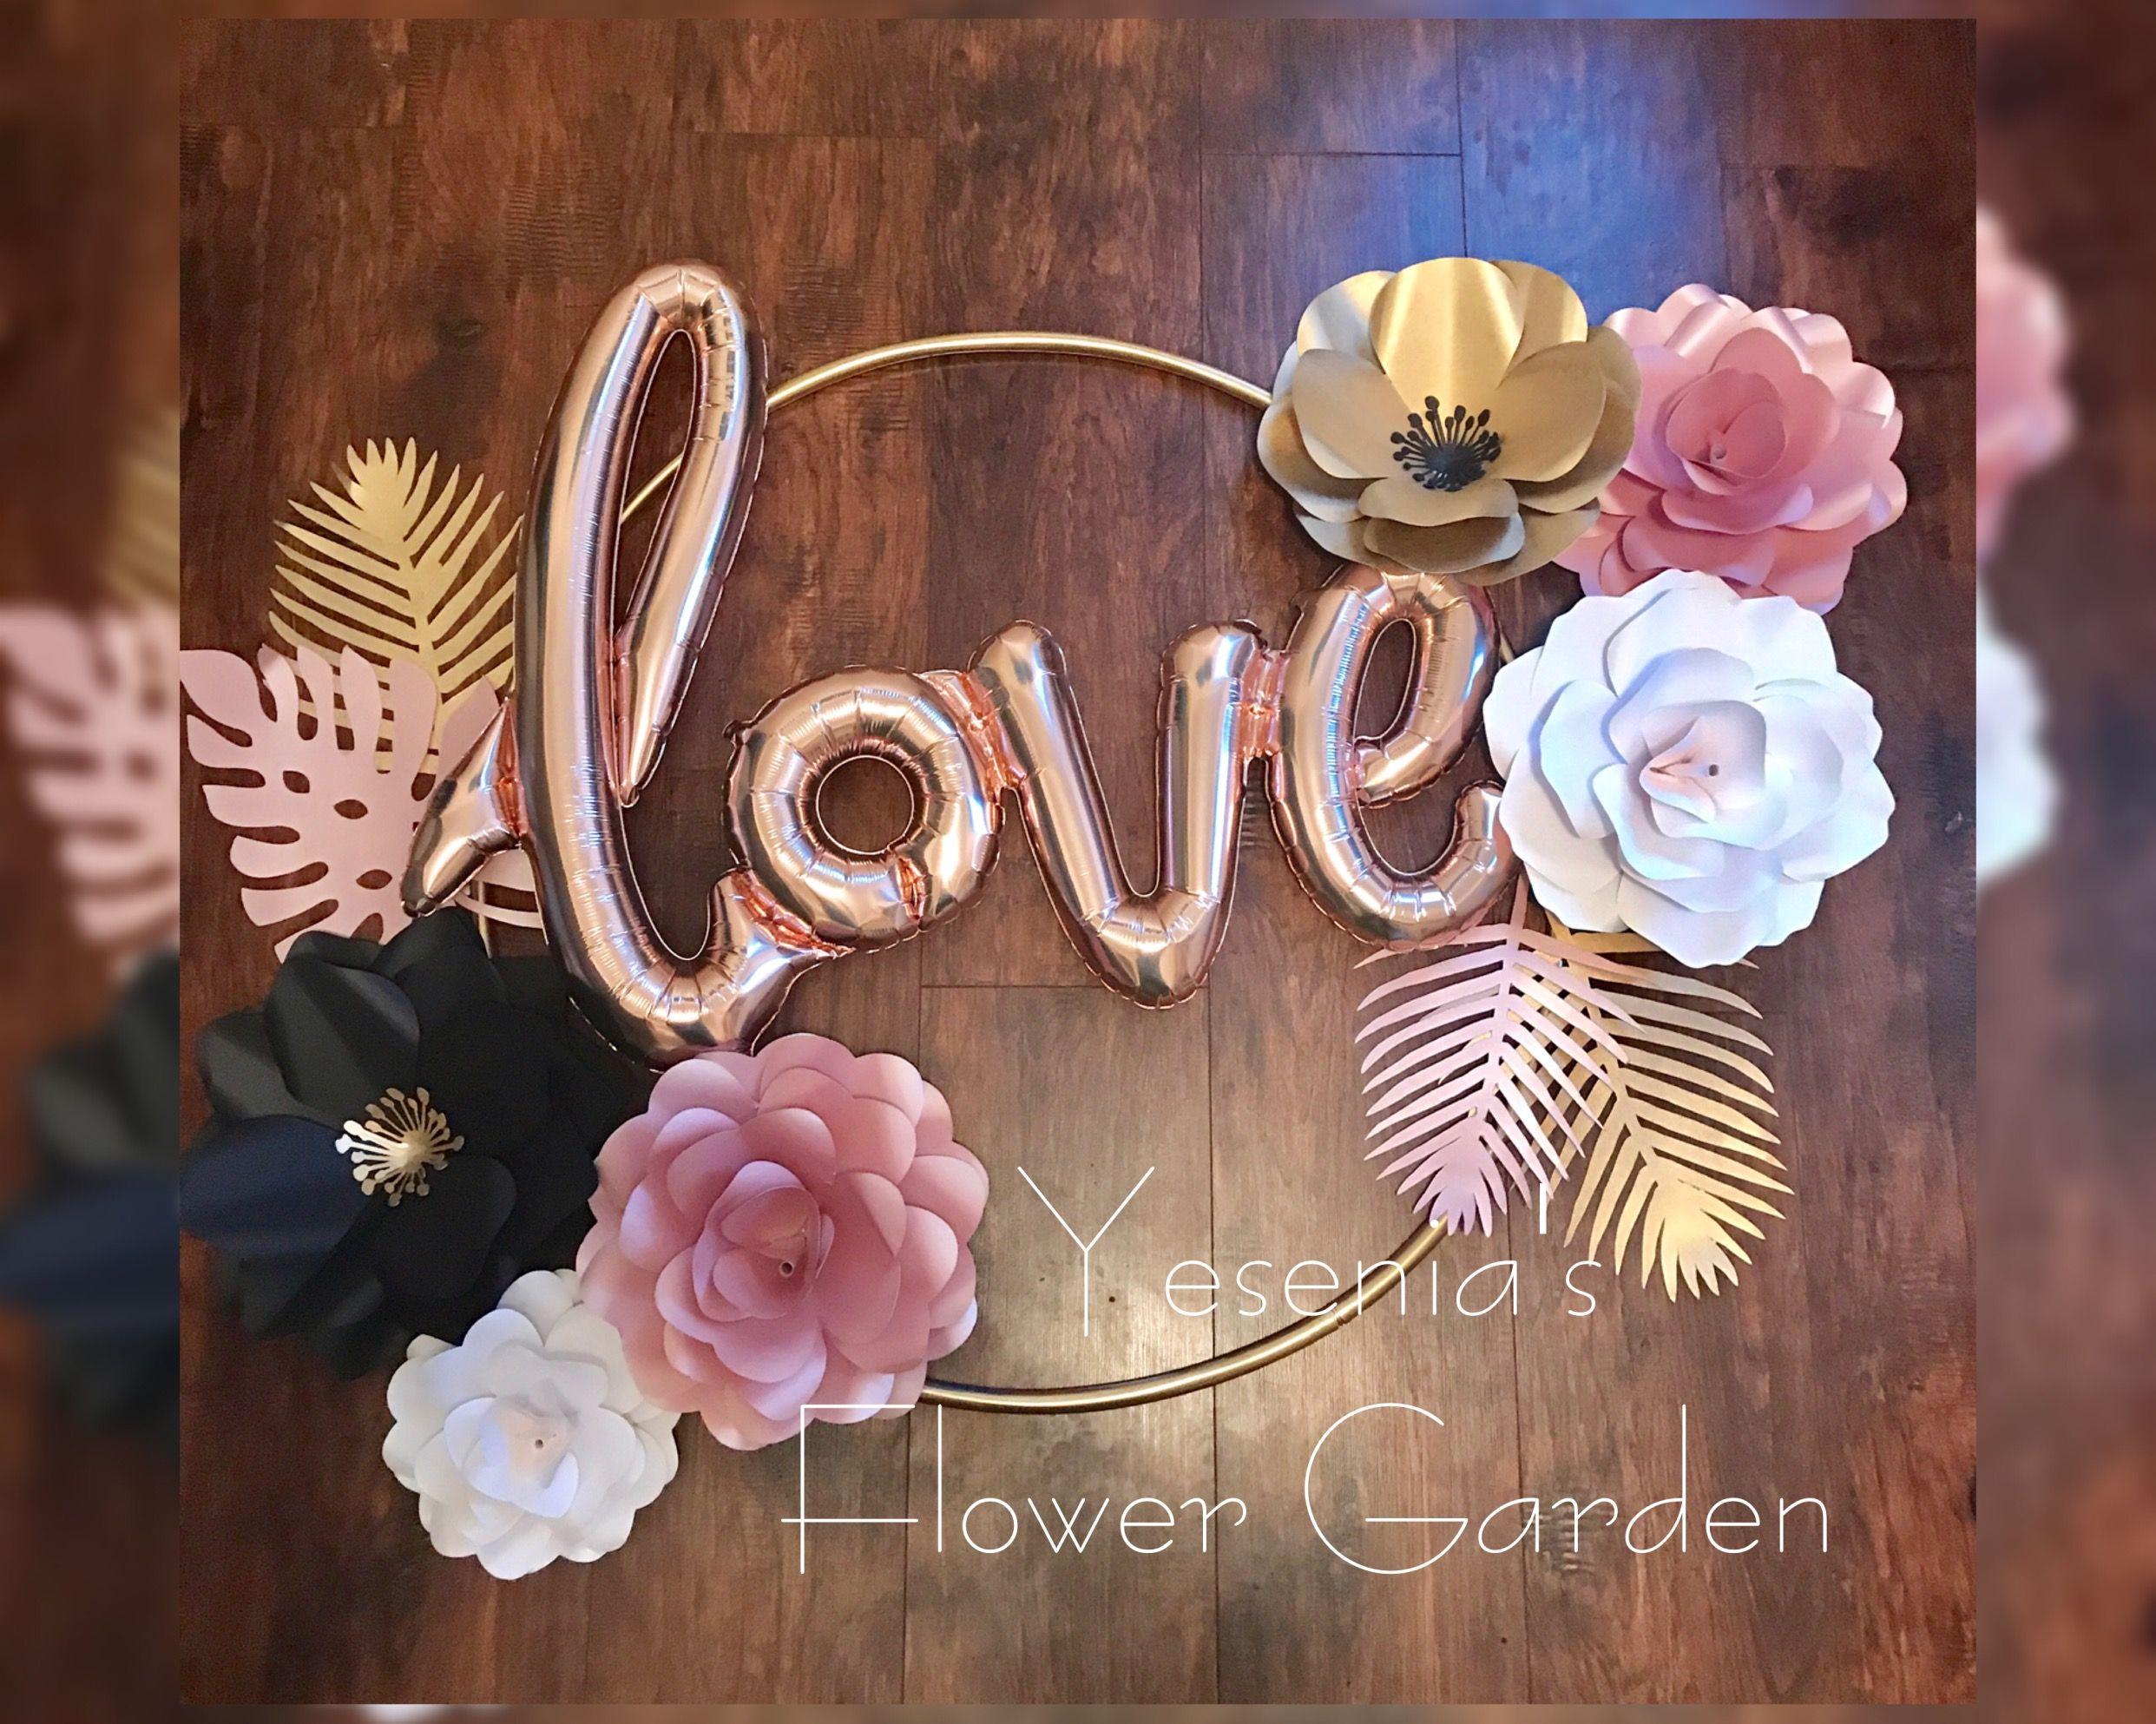 Paper Flowers Love Set Pinterest Hula Hoop Hula And Flowers